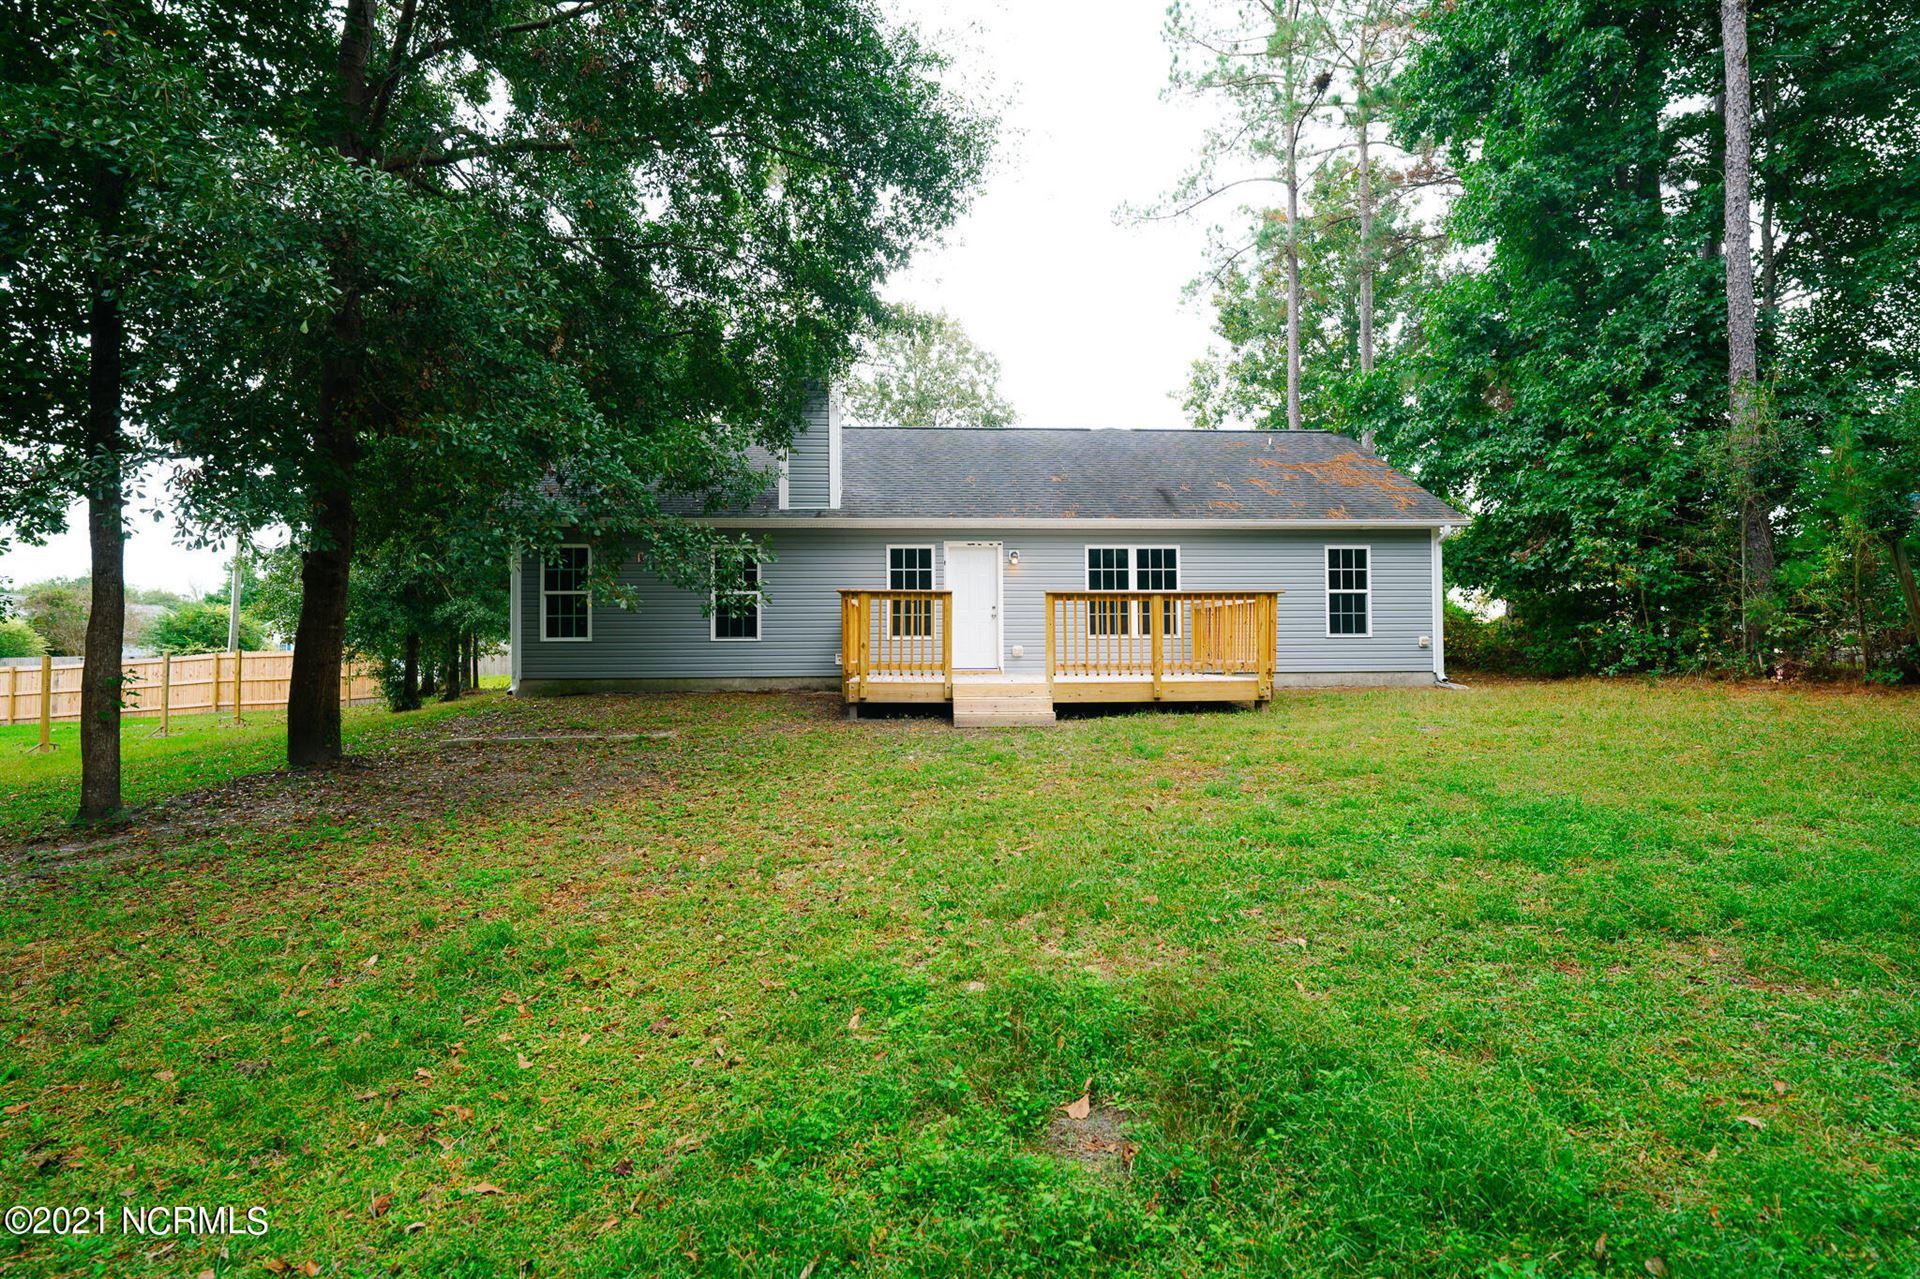 Photo of 149 Huckleberry Lane, Hubert, NC 28539 (MLS # 100295359)